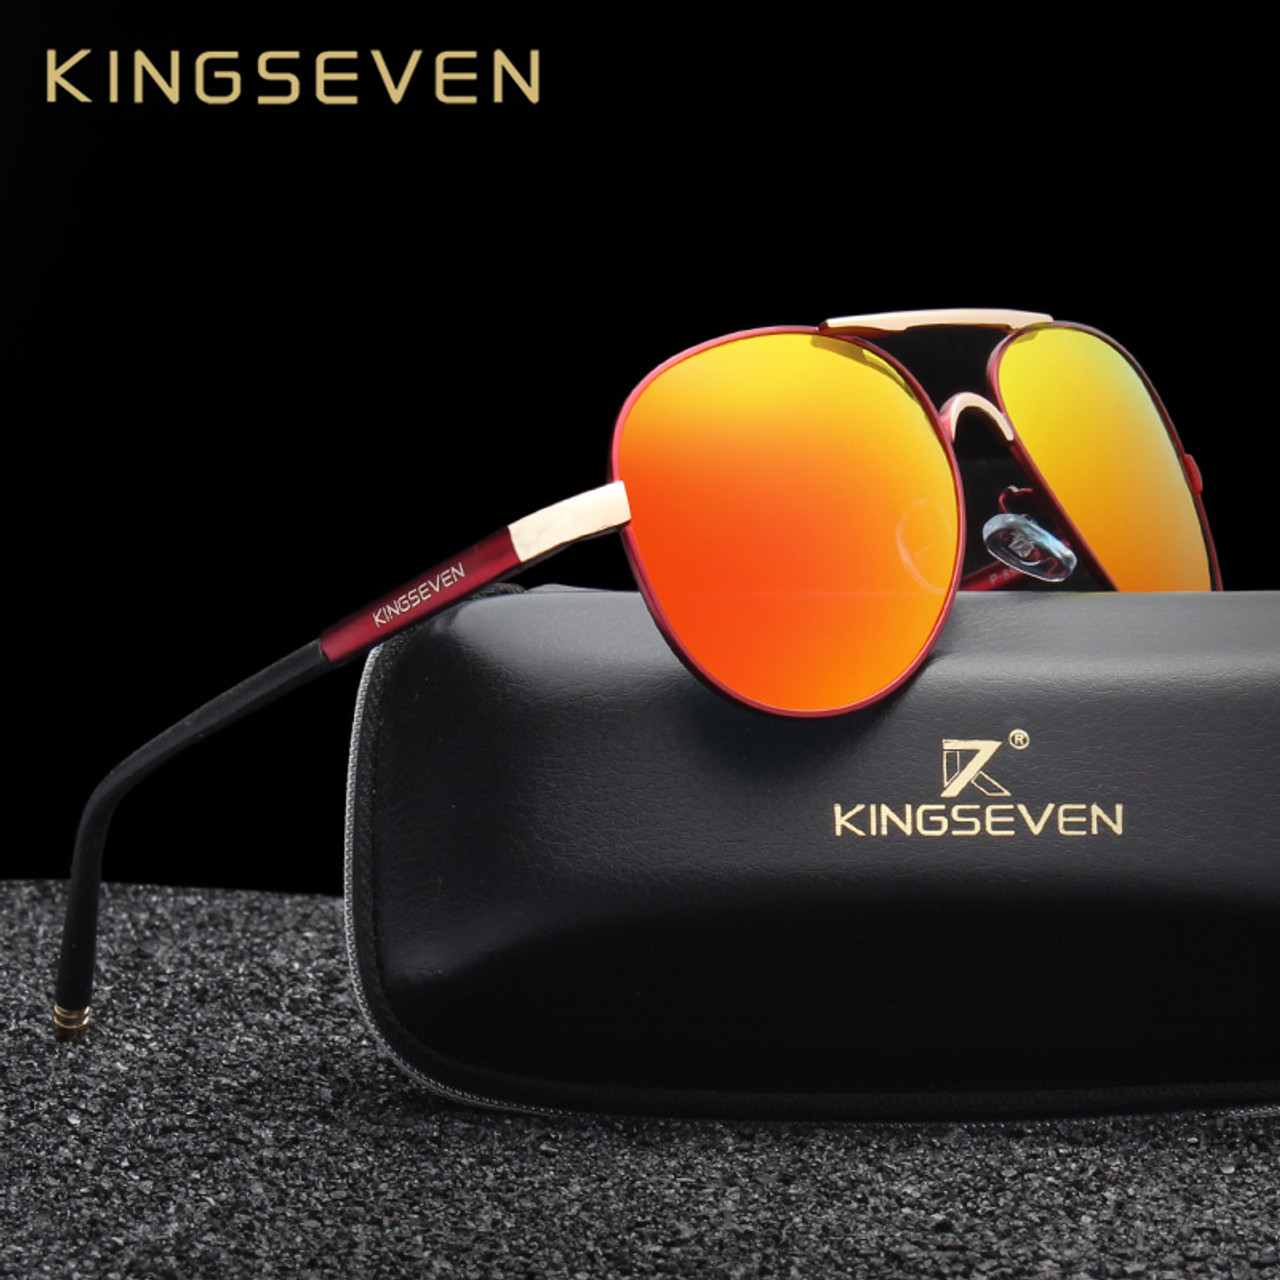 5b80bf7a50 KINGSEVEN Brand New Unisex Aluminum Polarized Sunglasses Women Men Design  Travel Driving Sun Glasses Classic Male Eyewear Gafas - OnshopDeals.Com